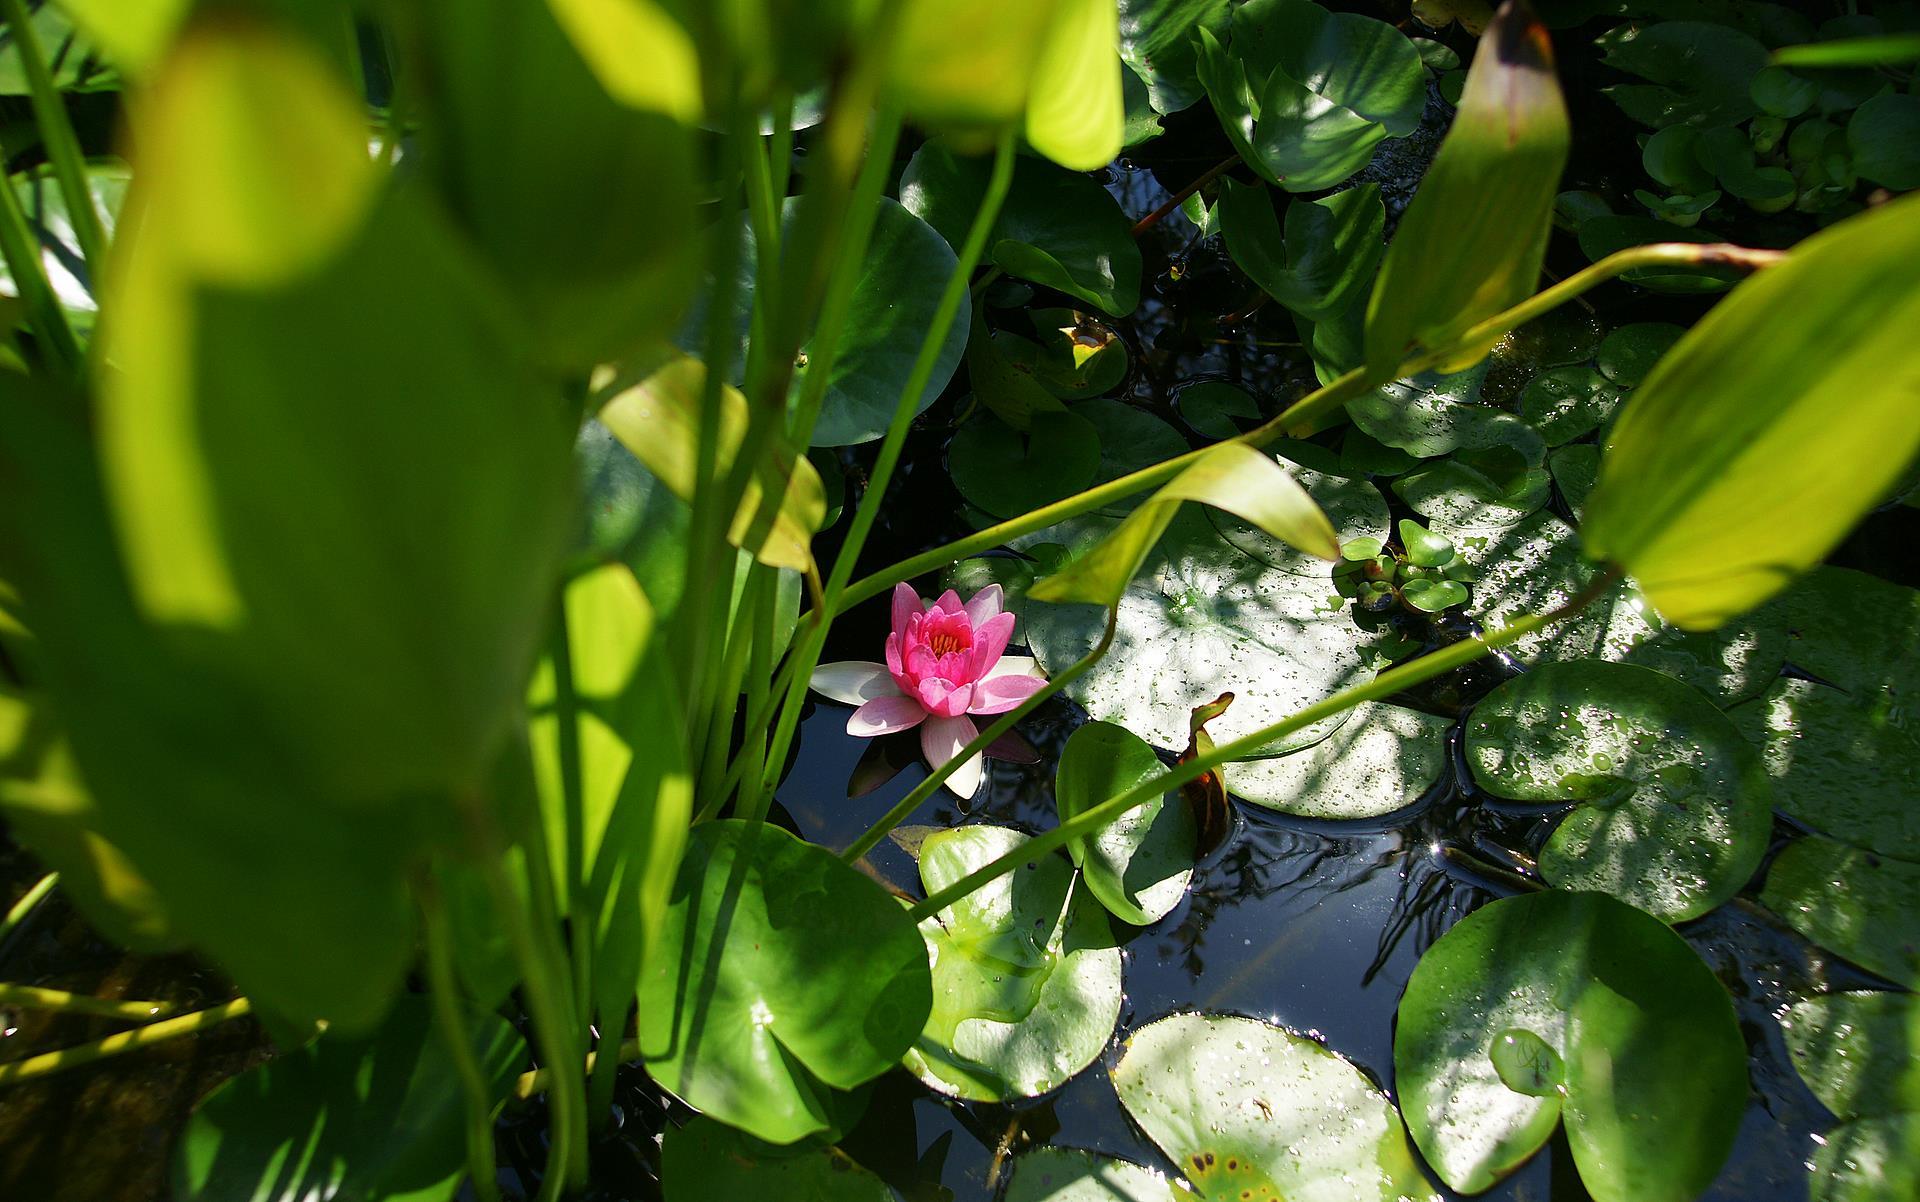 lotus flower 1440x900